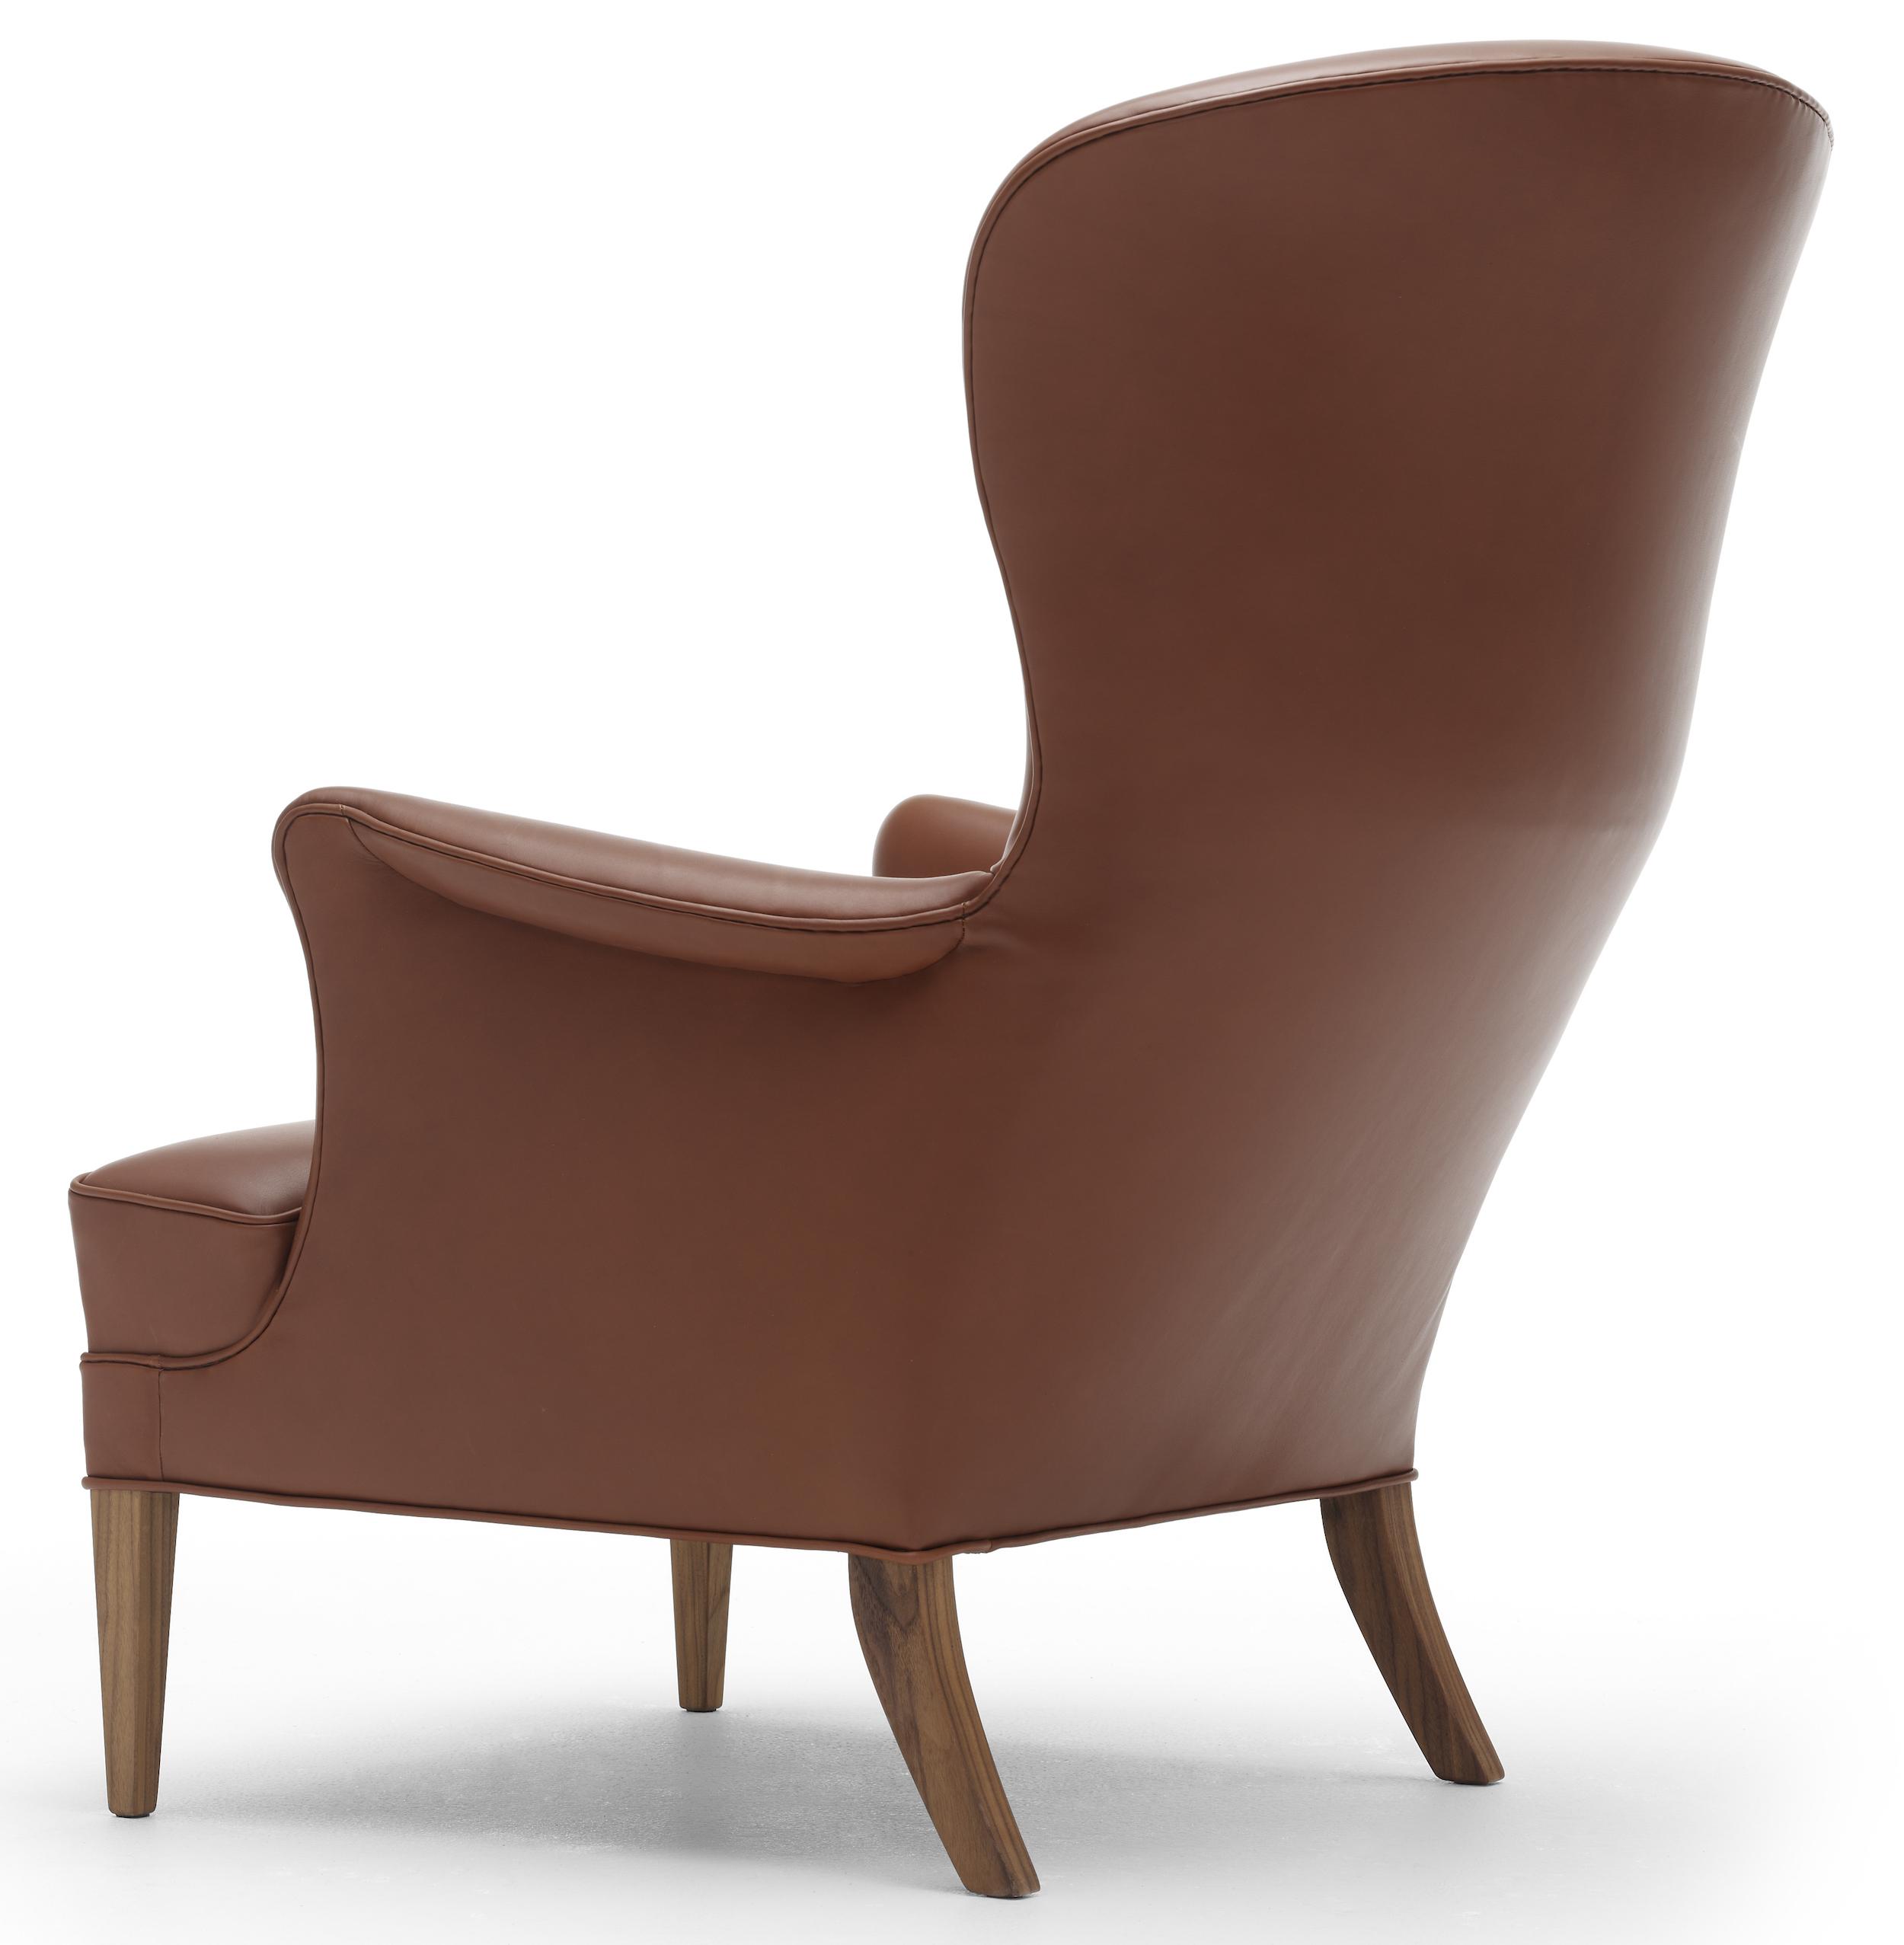 Remarkable Carl Hansen Son Heritage Chair Fh419 Footrest By Creativecarmelina Interior Chair Design Creativecarmelinacom